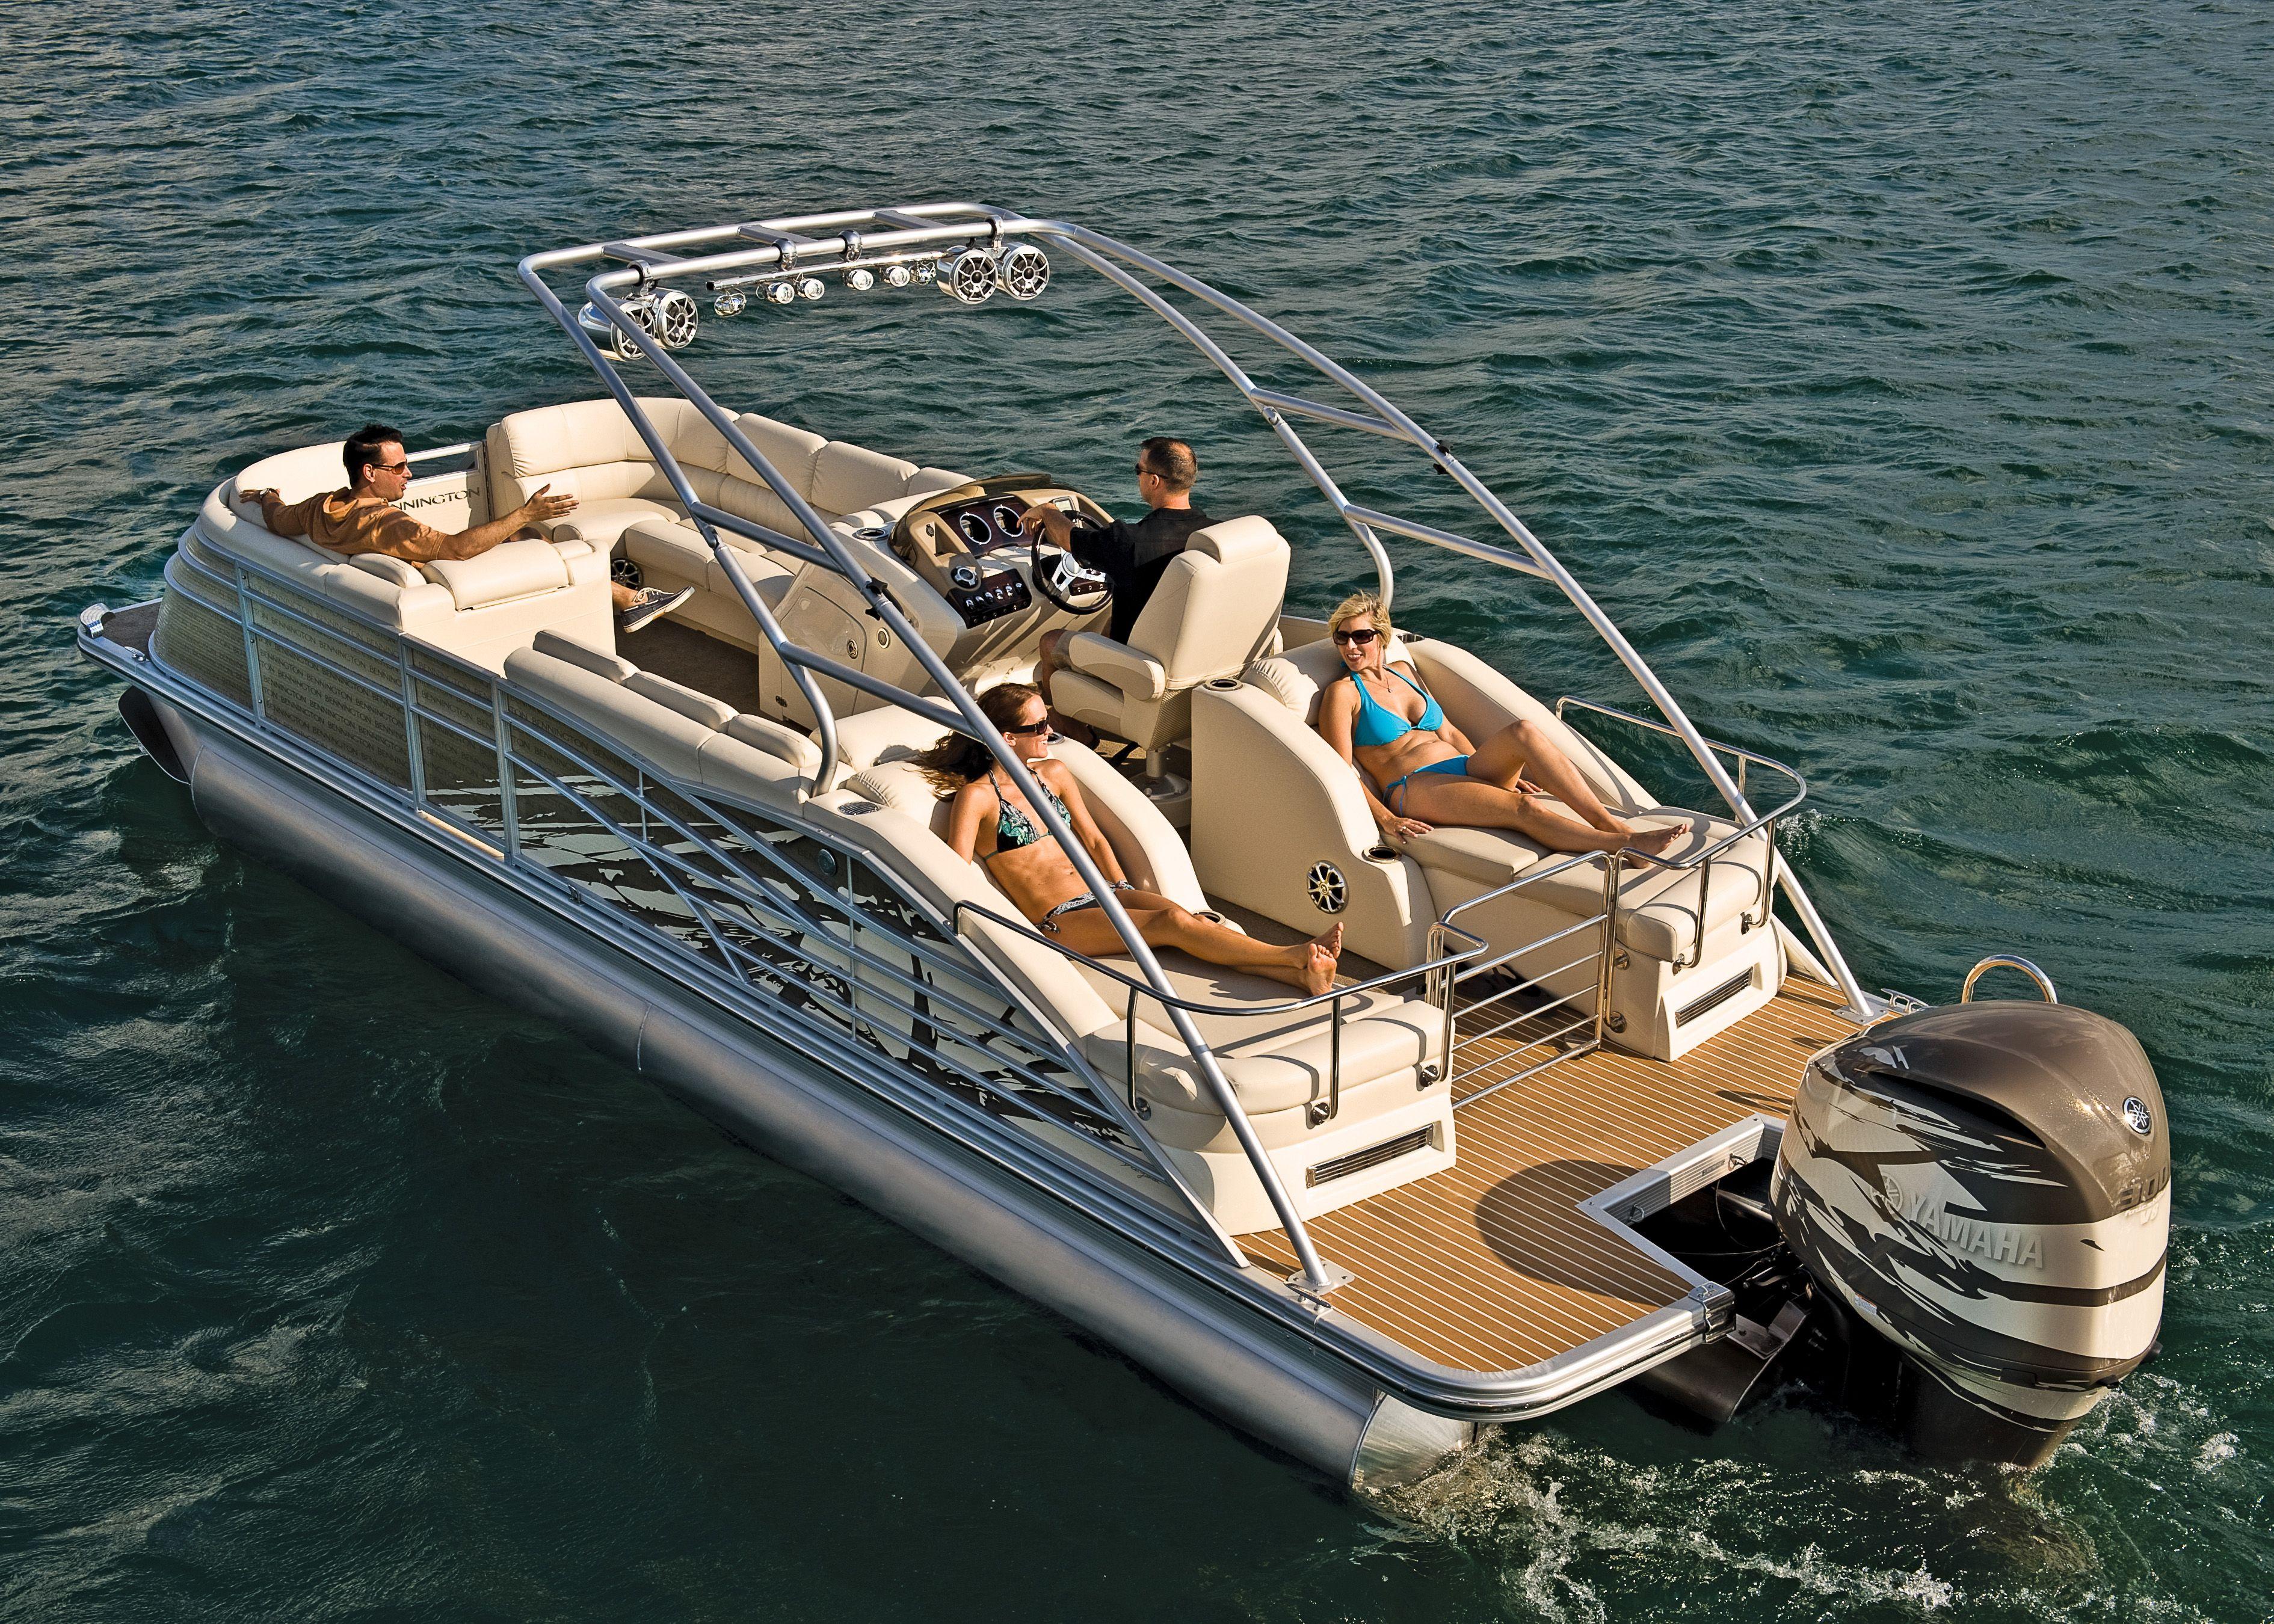 hight resolution of 2012 bennington q25 pontoon boat from bennington pontoon great for sunnyday boating